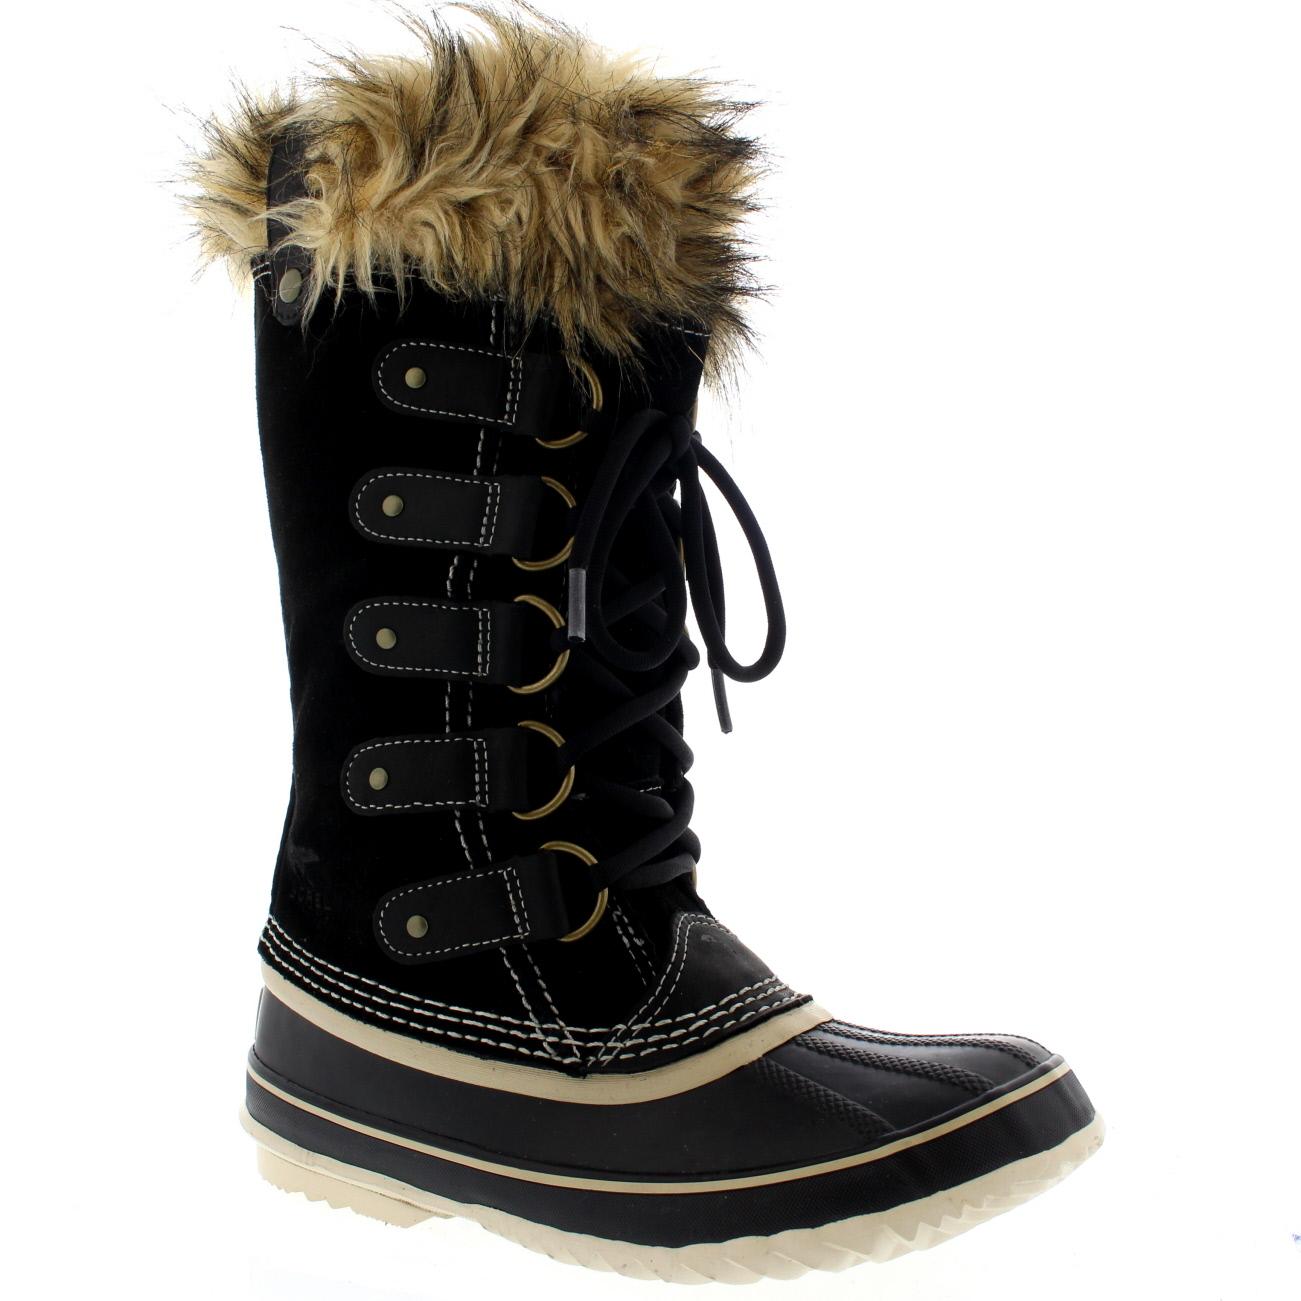 womens sorel joan of arctic snow waterproof winter boots. Black Bedroom Furniture Sets. Home Design Ideas